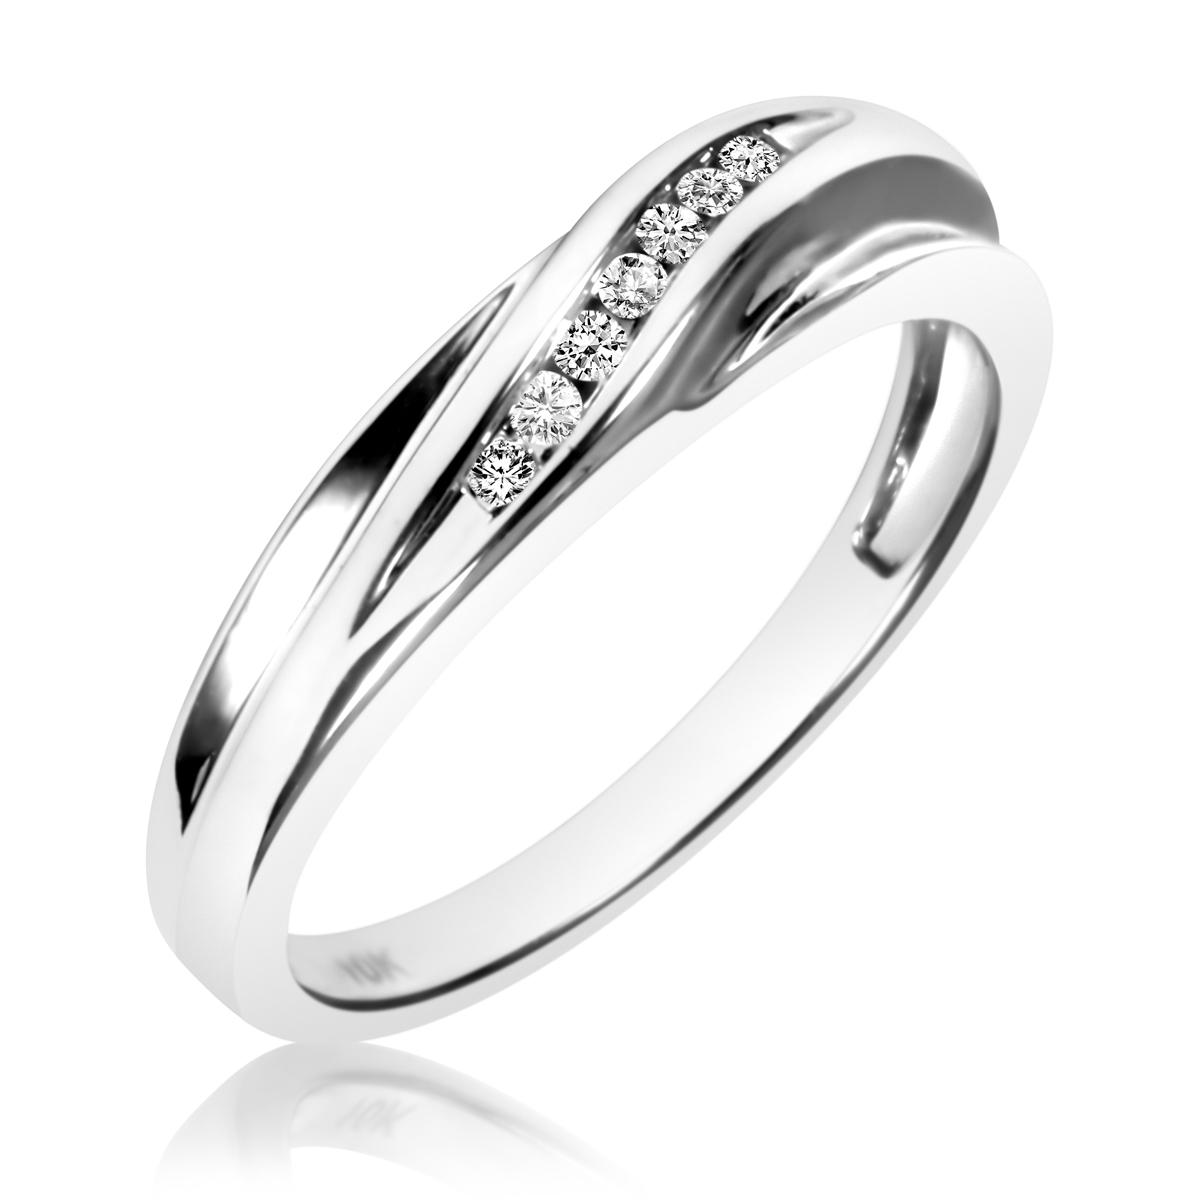 1/15 Carat T.W. Round Cut Diamond Ladies Wedding Band 10K White Gold- Size 8